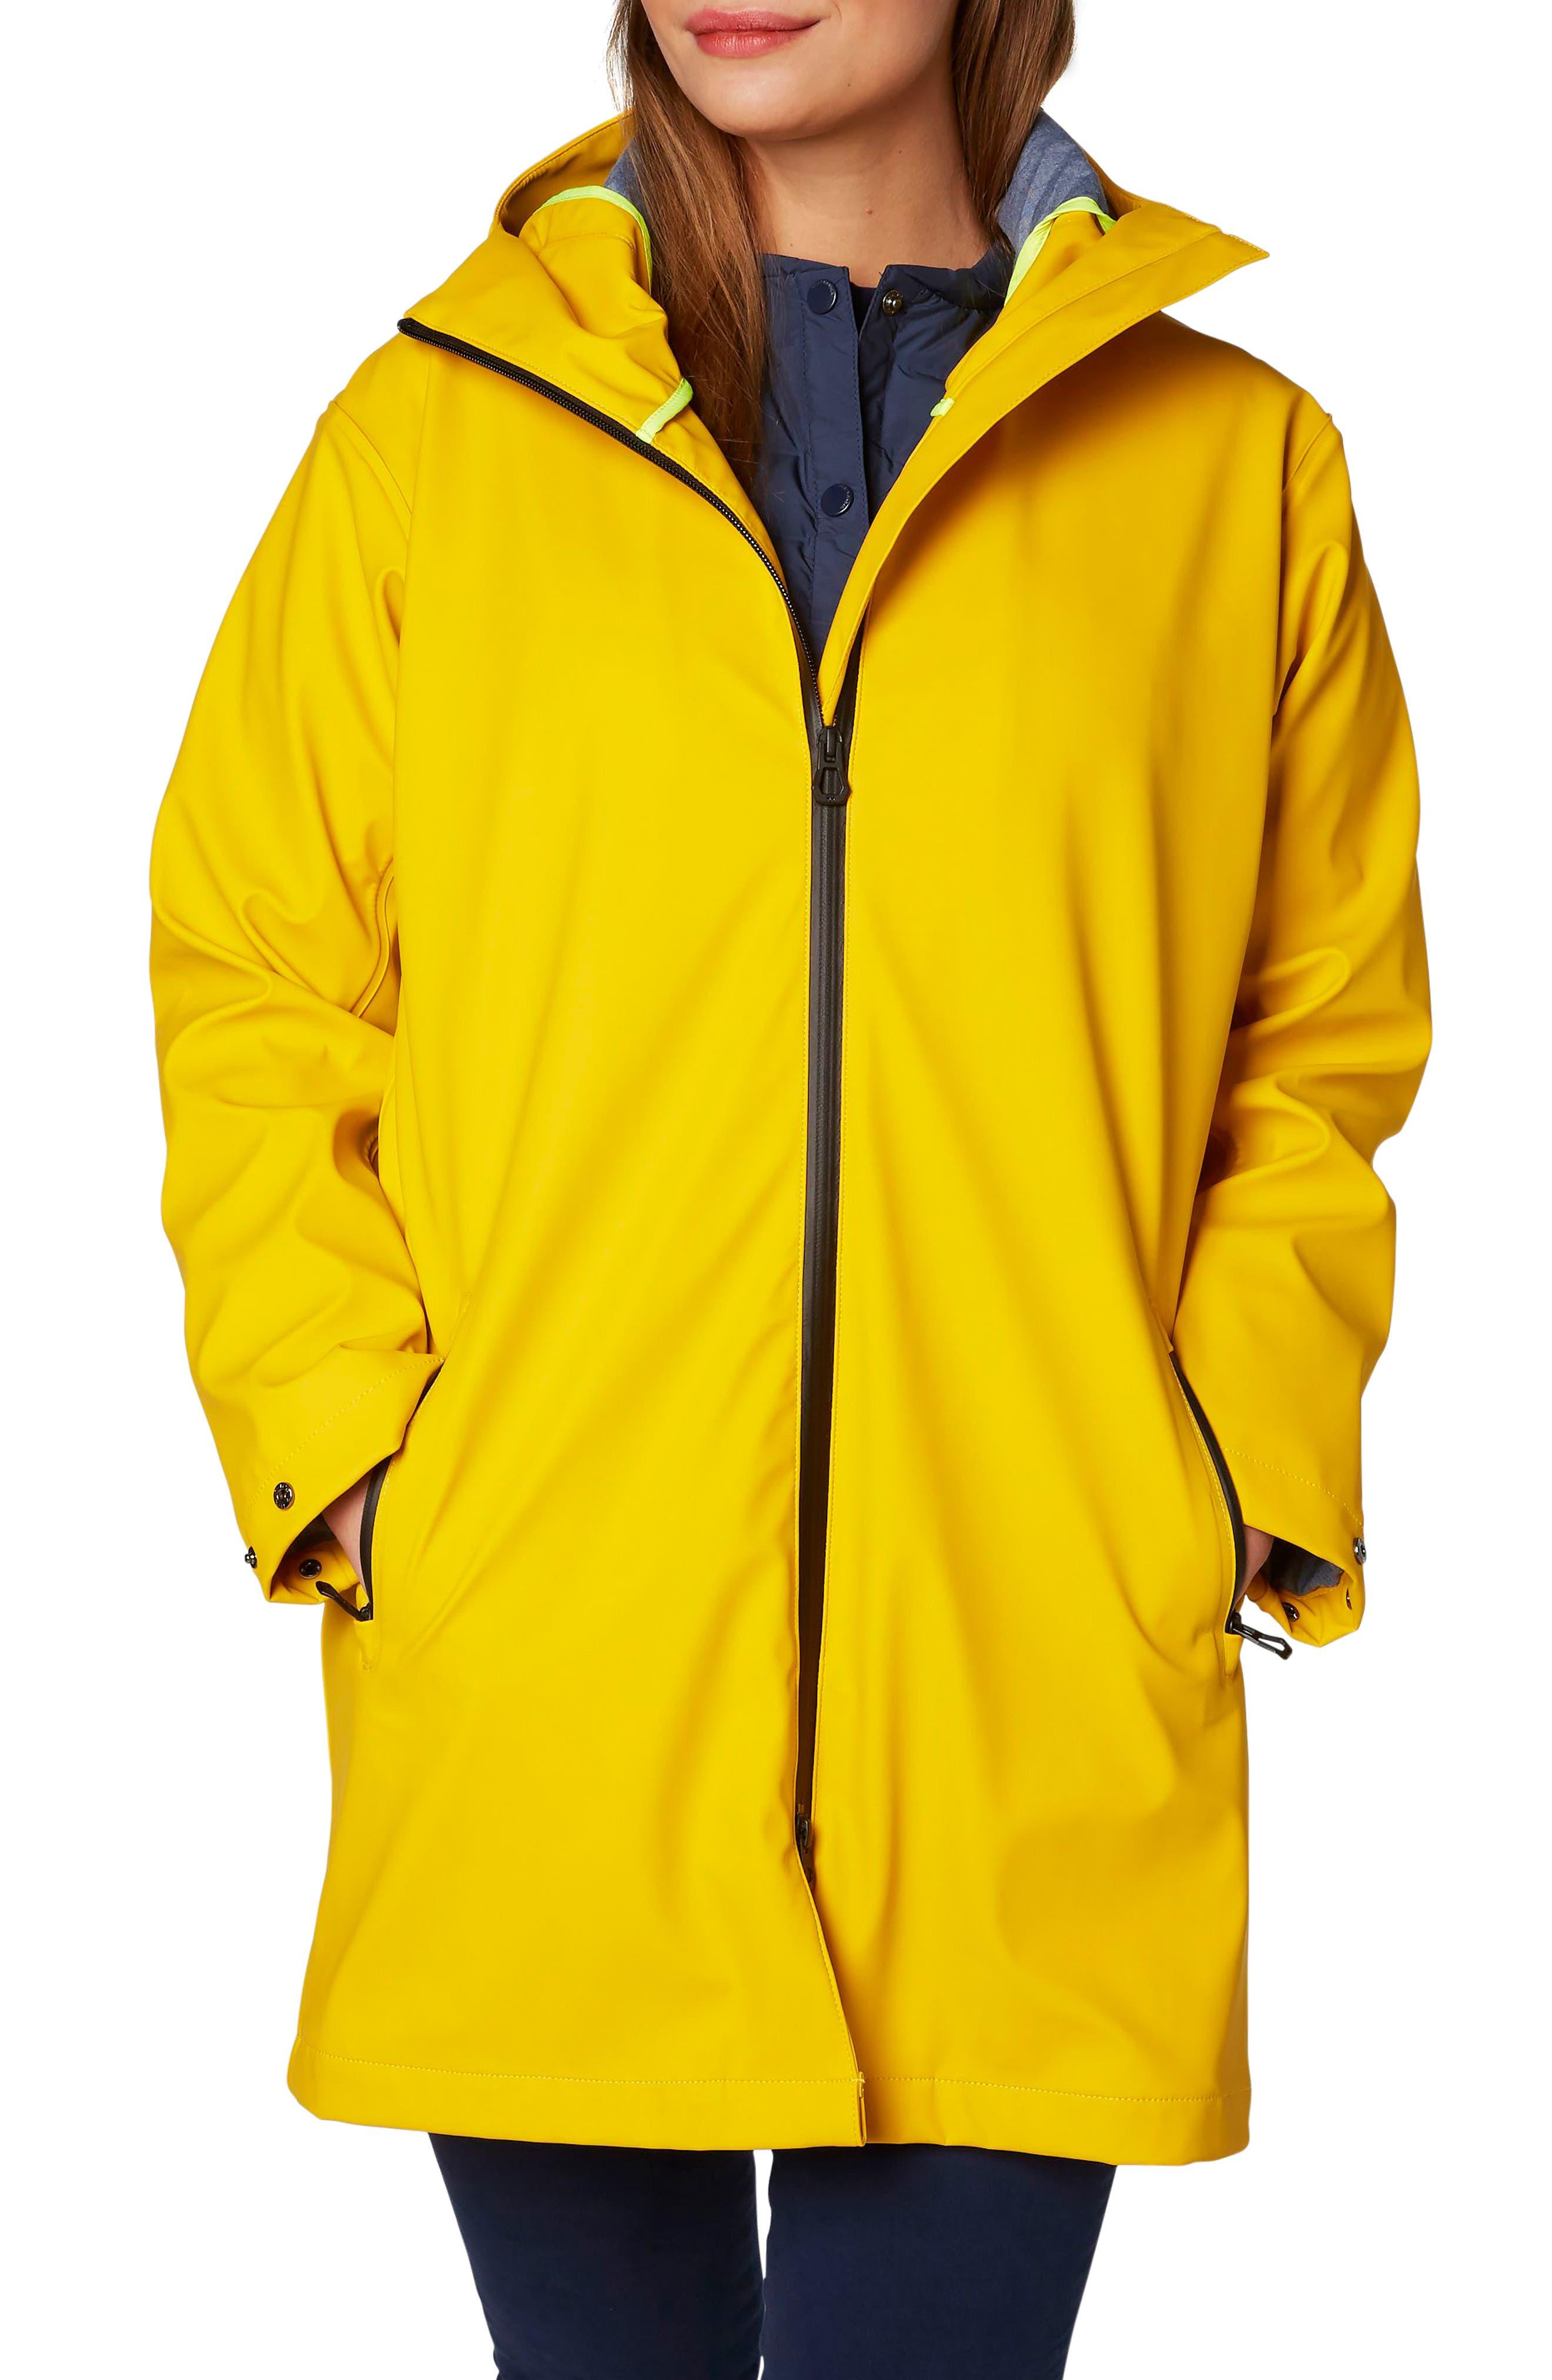 Helly Hansen Copenhagen Hooded Rain Jacket